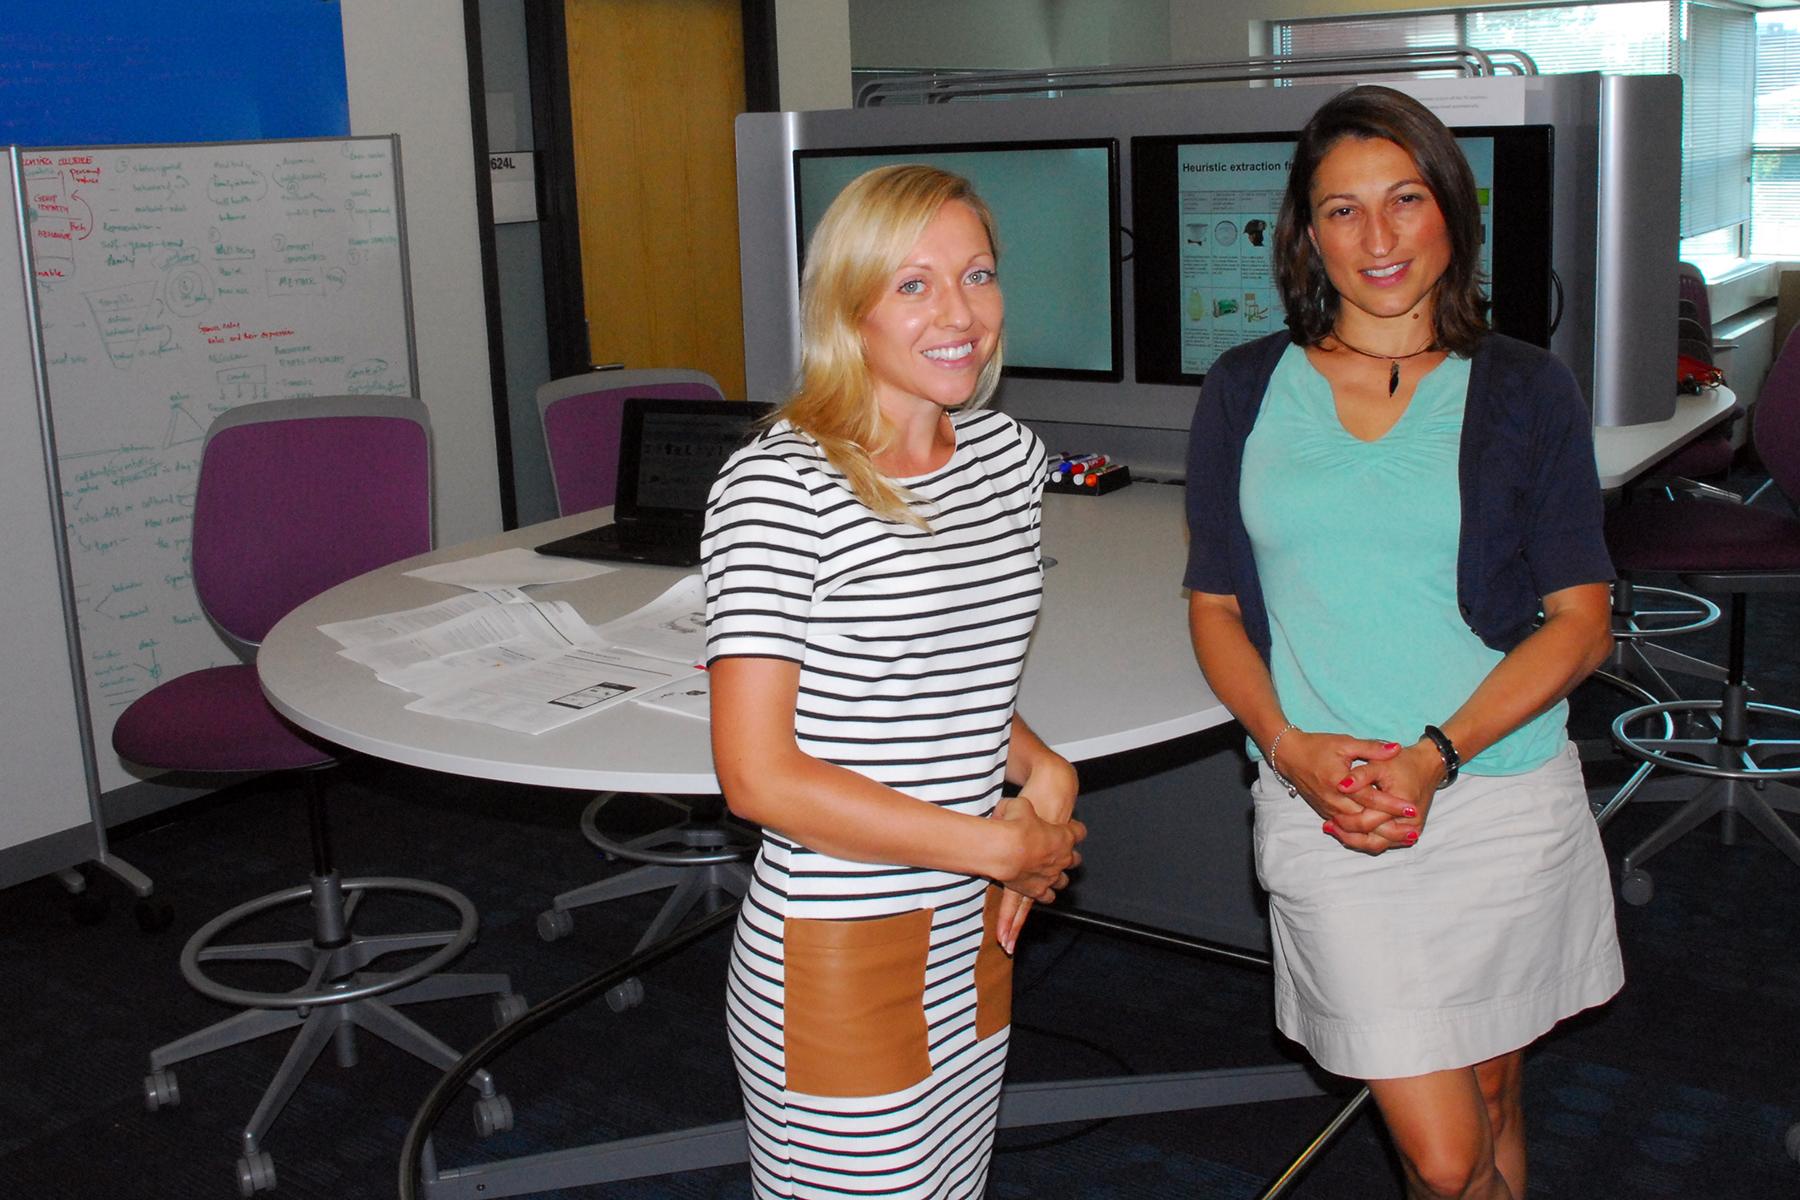 Iowa State industrial design Postdoctoral Research Associate Keelin Leahy, left, and Associate Professor Seda McKilligan